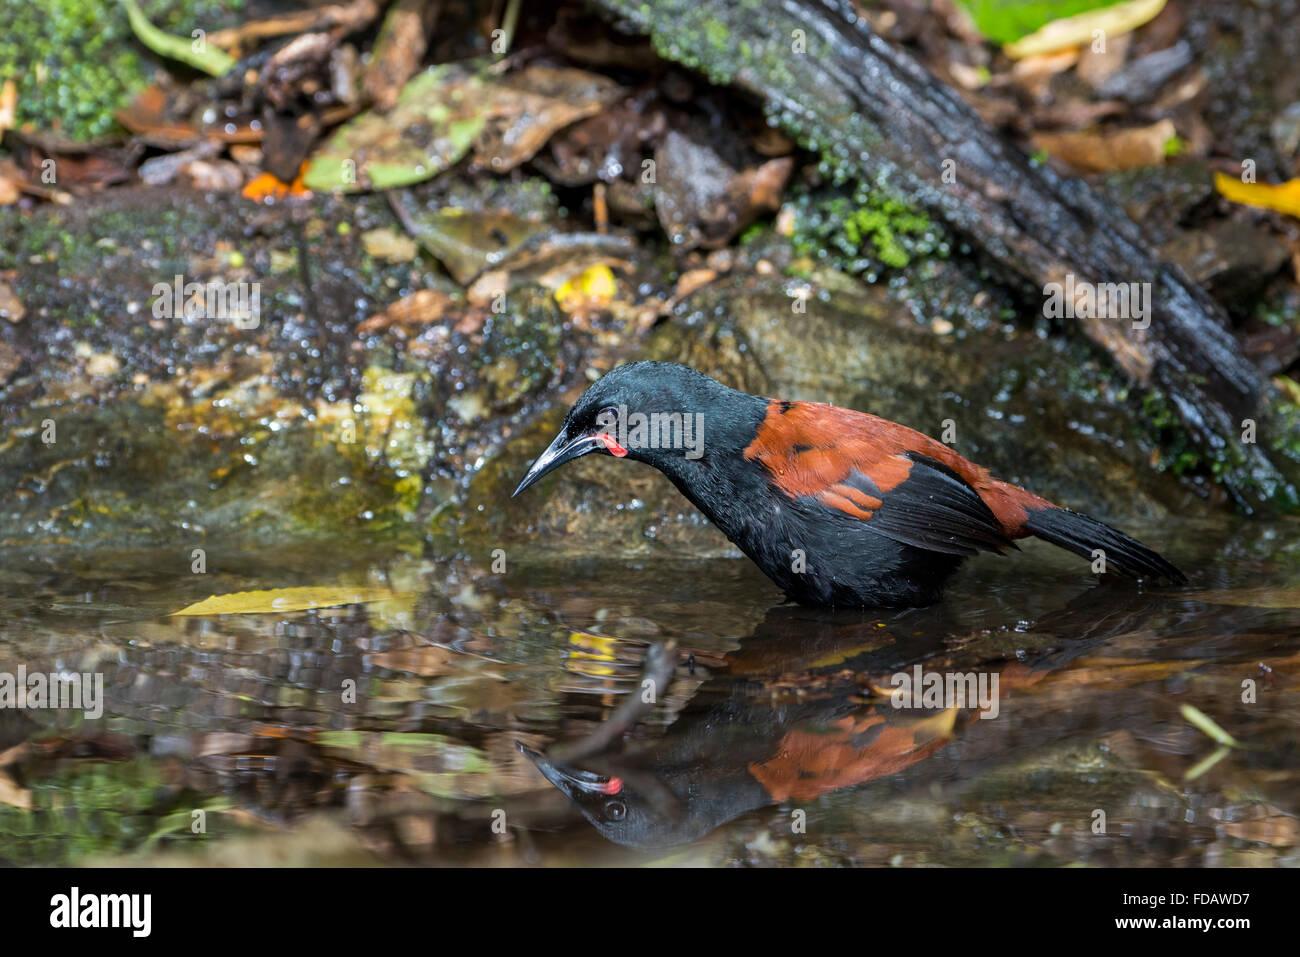 Nuova Zelanda Marlborough Sounds, Isola di Motuara aka Motu Ara. Predator-free Island Bird Reserve. Maschio Isola del Sud a doppio spiovente. Foto Stock